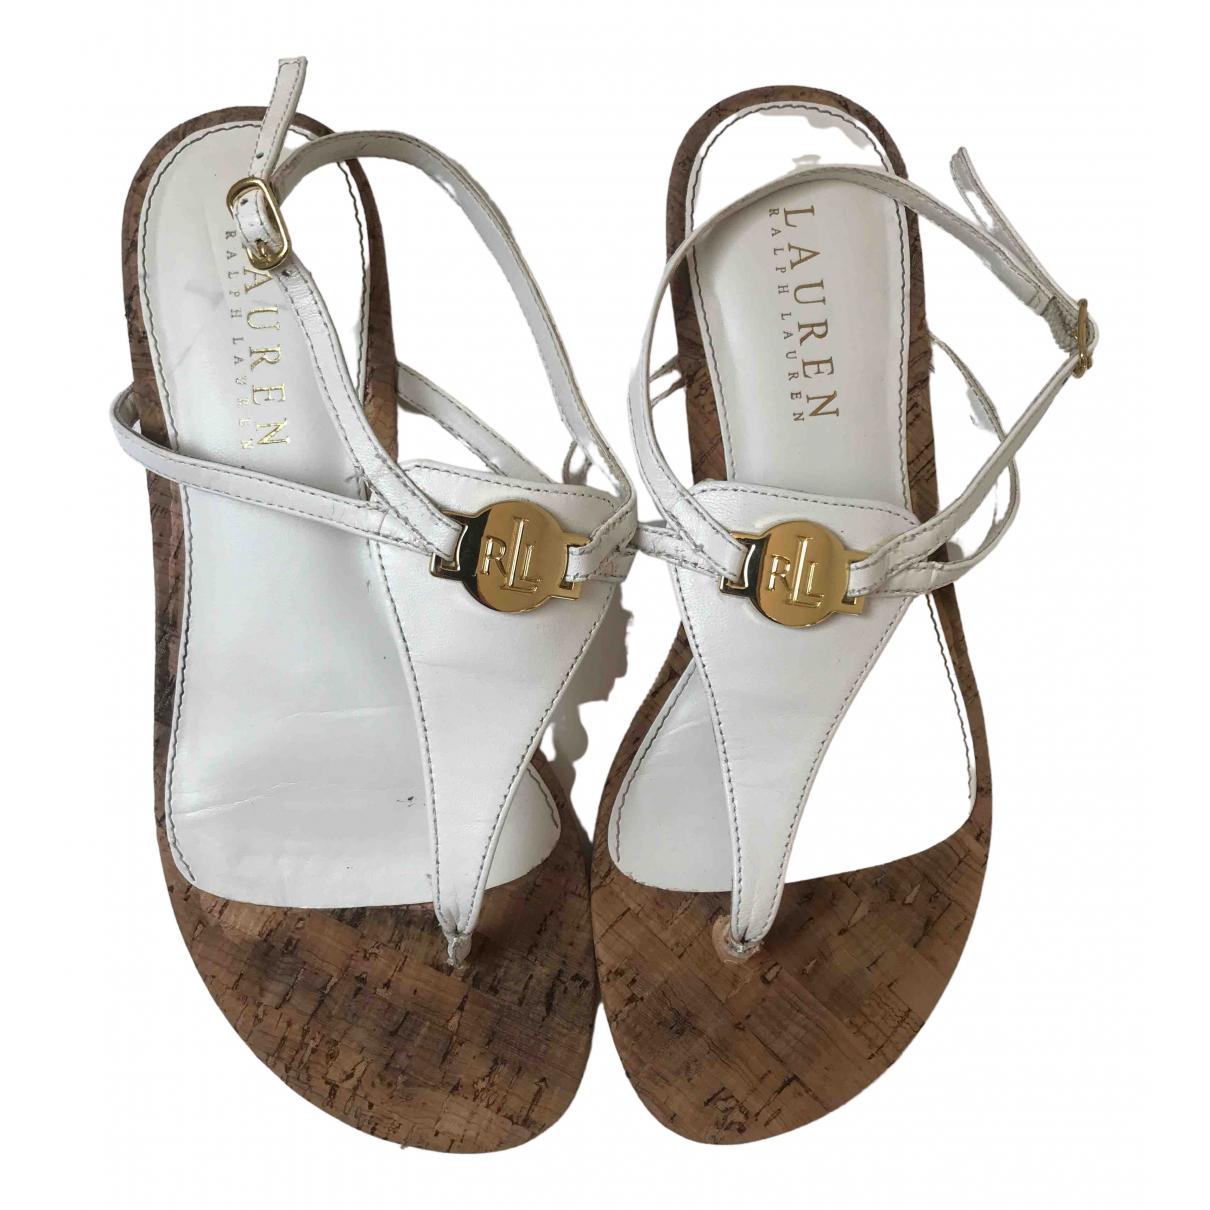 Lauren Ralph Lauren N White Leather Sandals for Women 5.5 UK